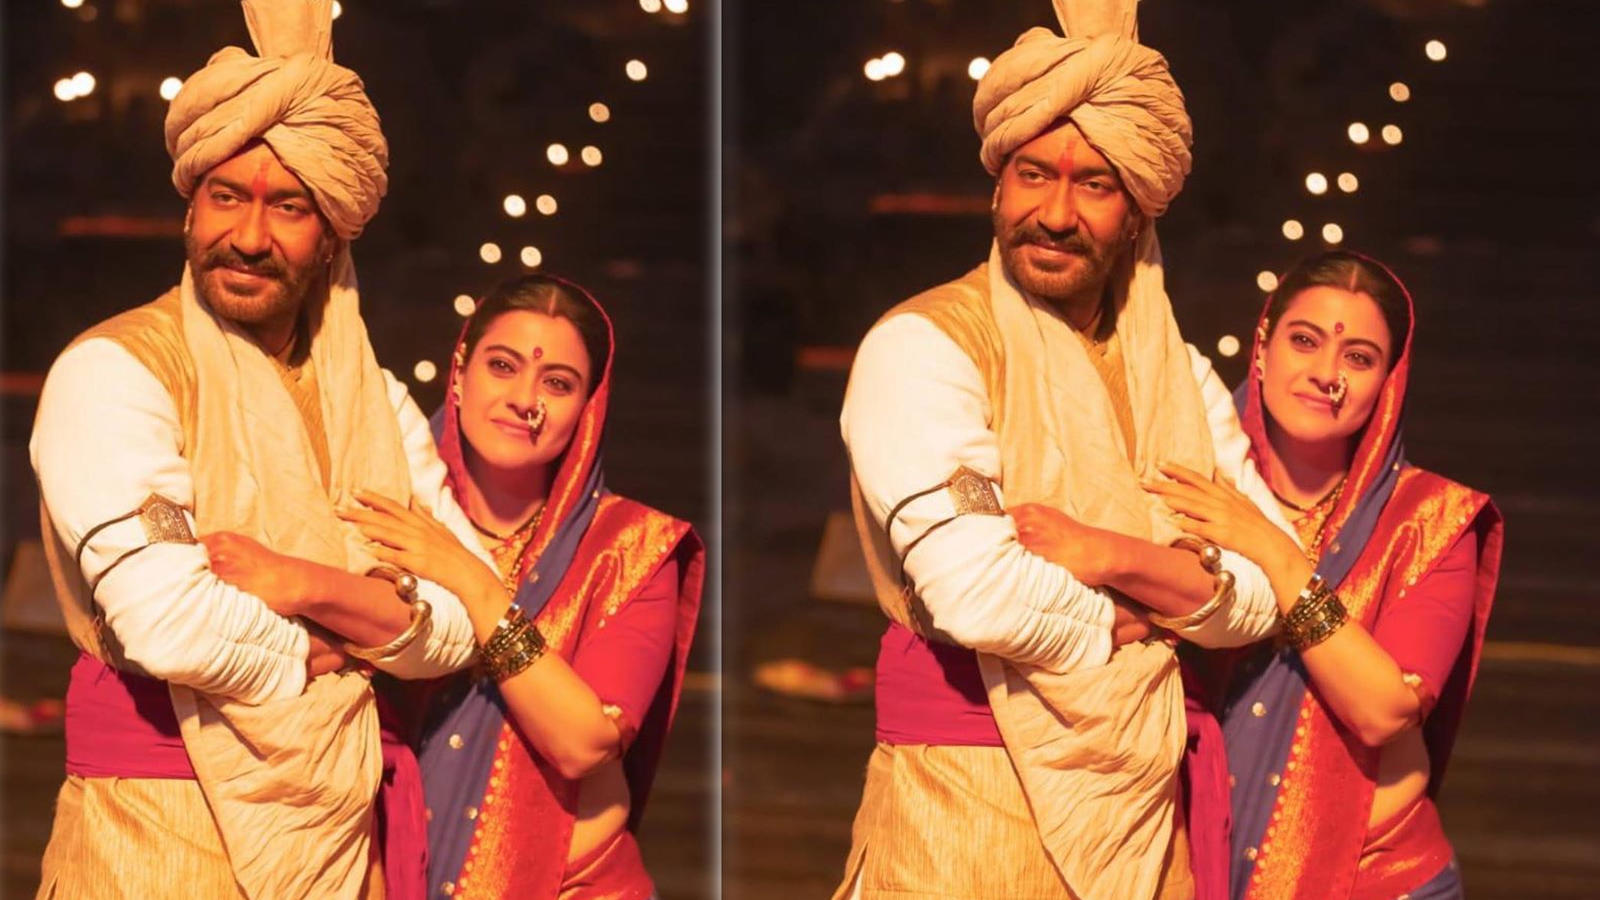 Ajay Devgn and Kajol's new pic from 'Tanhaji: The Unsung Warrior' wins hearts